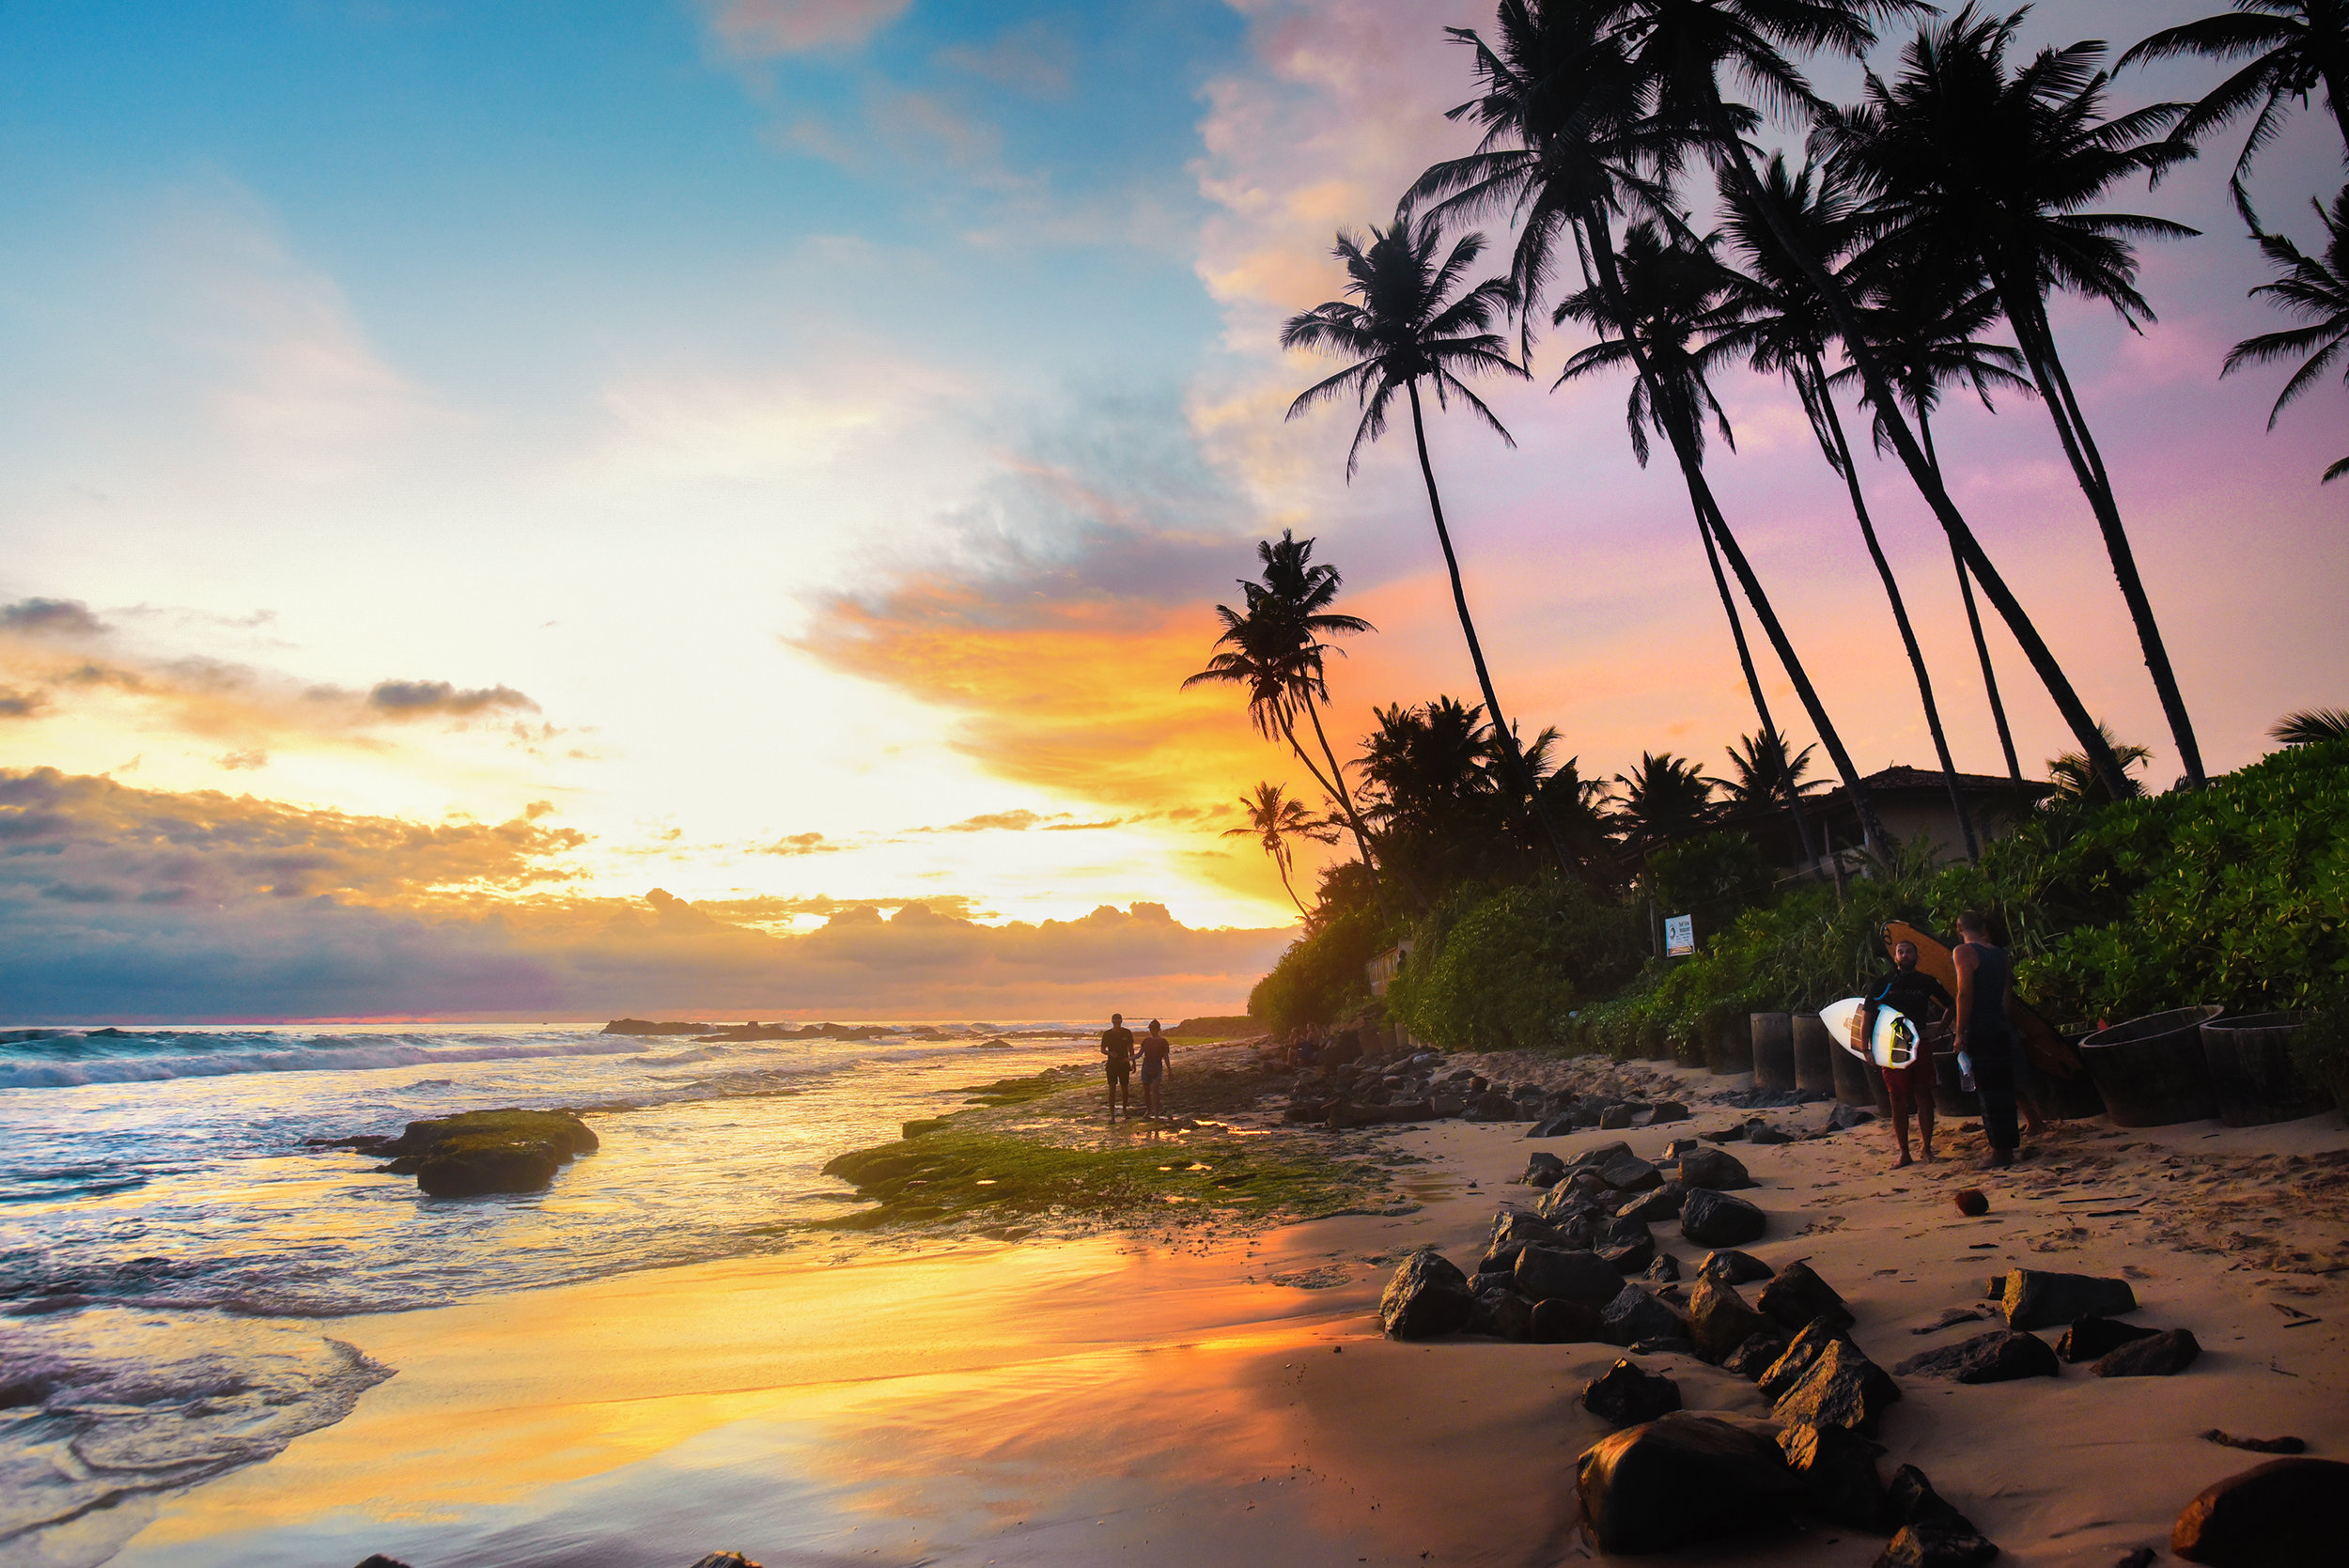 Sri Lanka surfer beach sunset